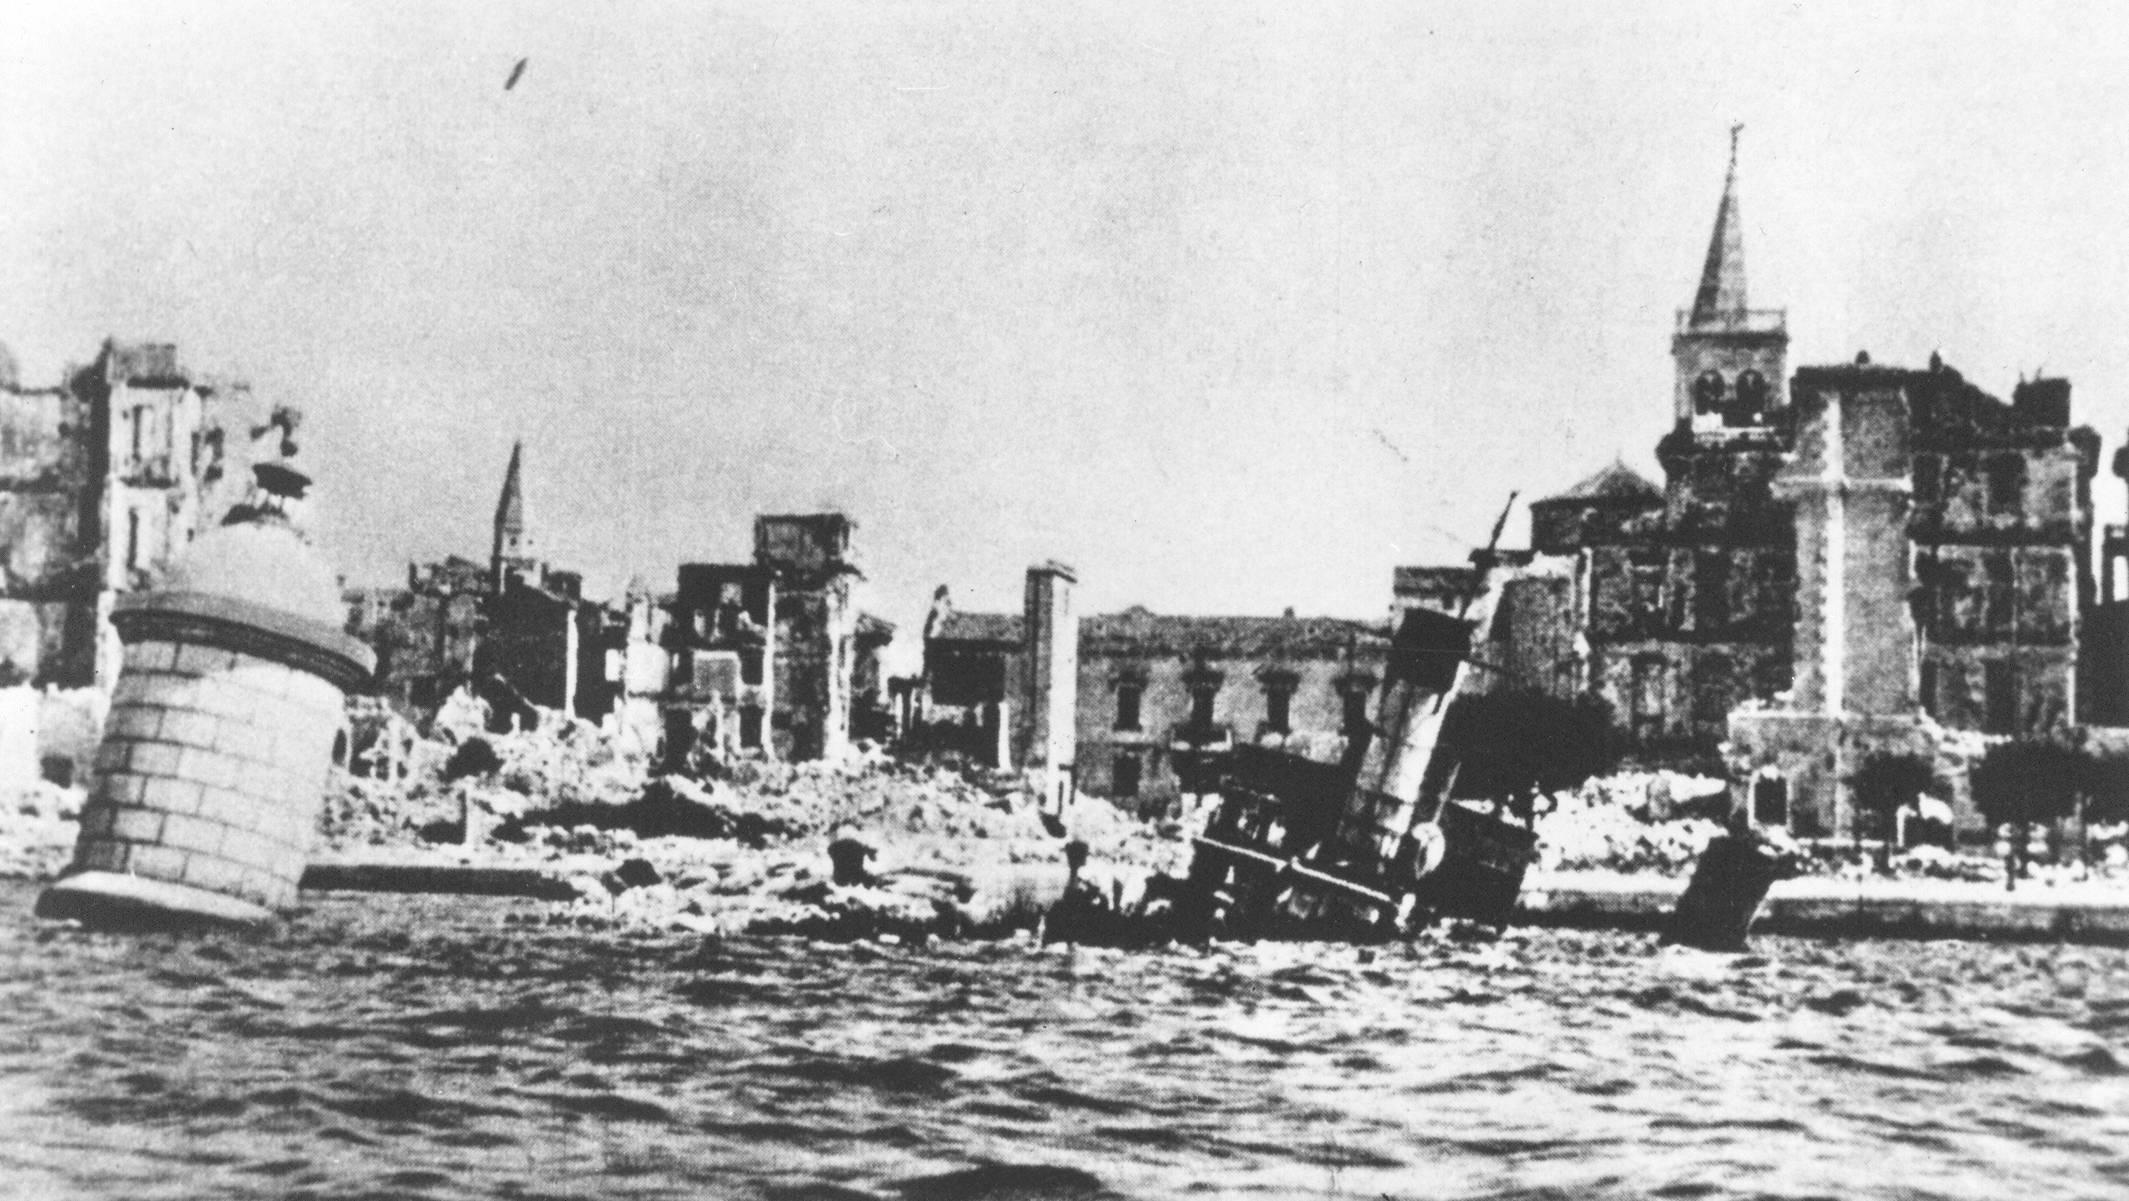 Grad Zadar Podupire Stradalnike Domovinskog I 2 Svjetskog Rata